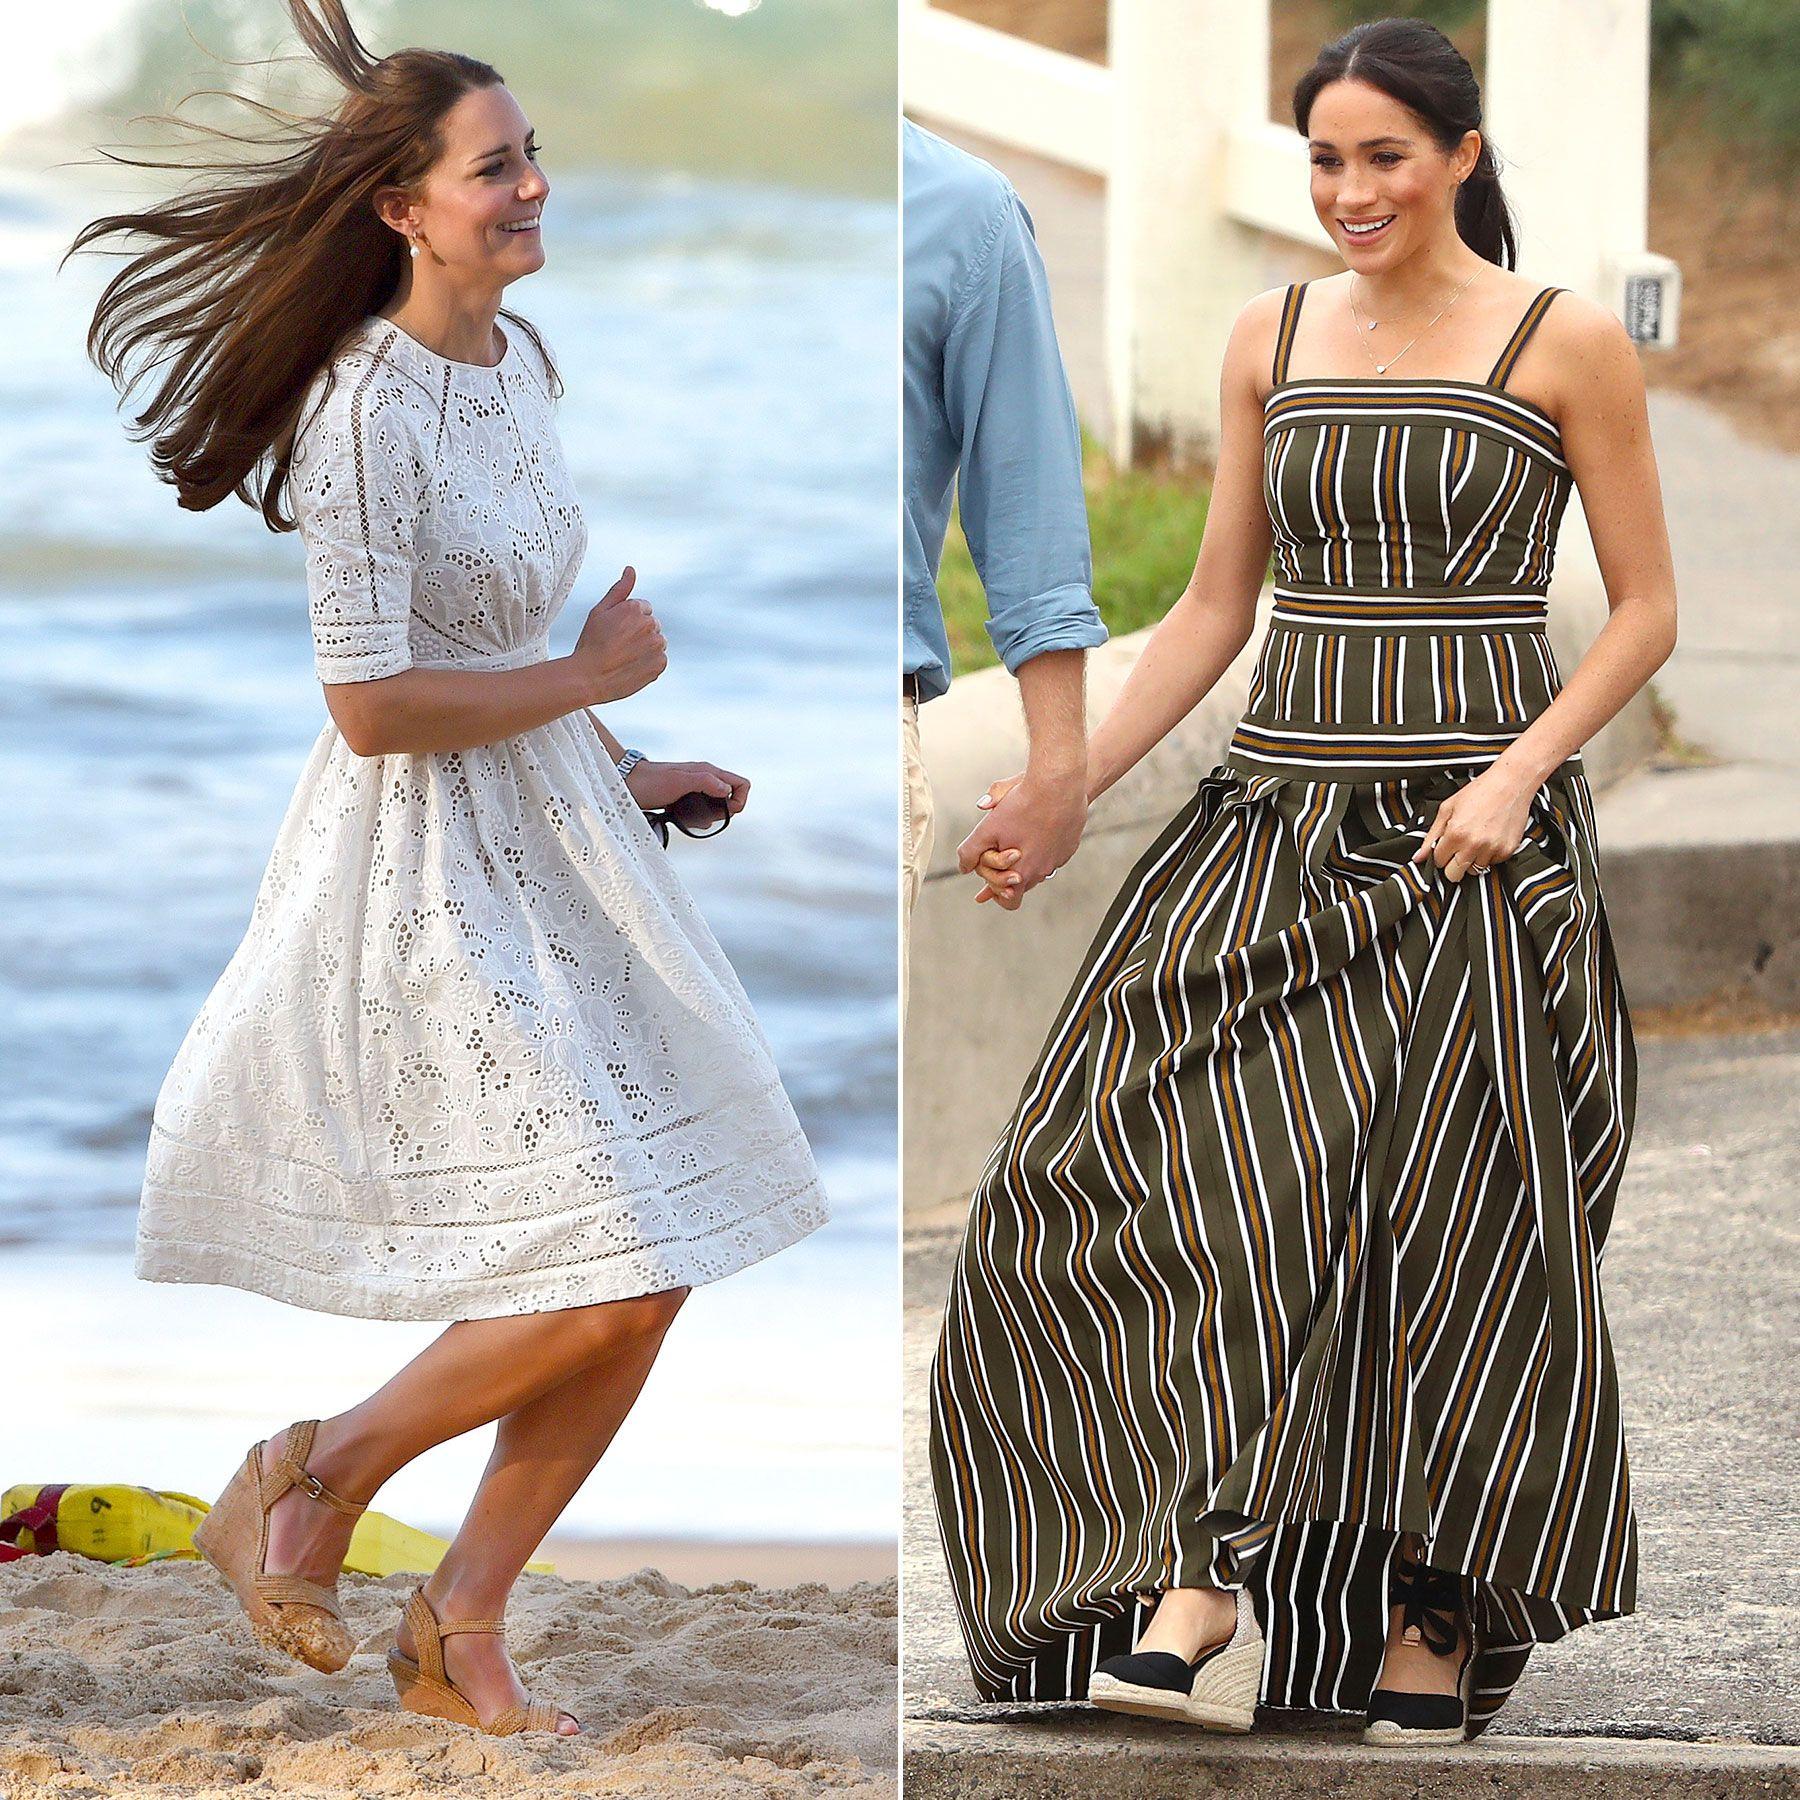 Meghan Markle Channels Kate Middleton's Australian Beach